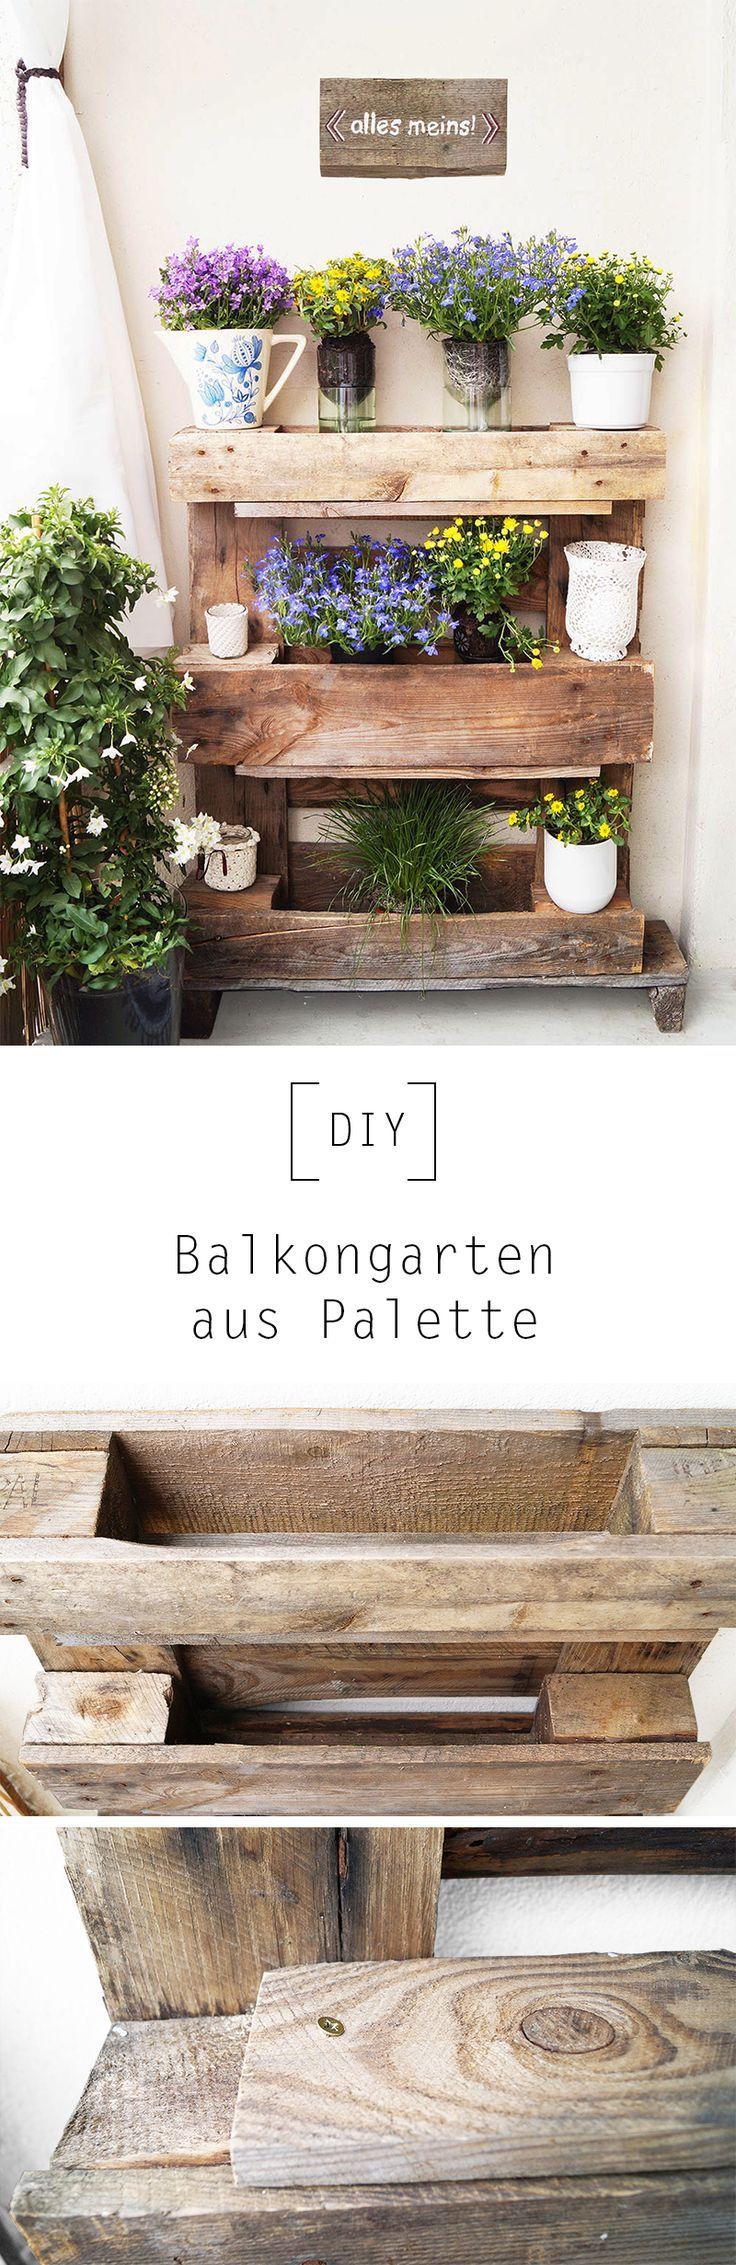 balkongarten aus palette by nur noch diy anleitung bayern diy pinterest balkongarten. Black Bedroom Furniture Sets. Home Design Ideas